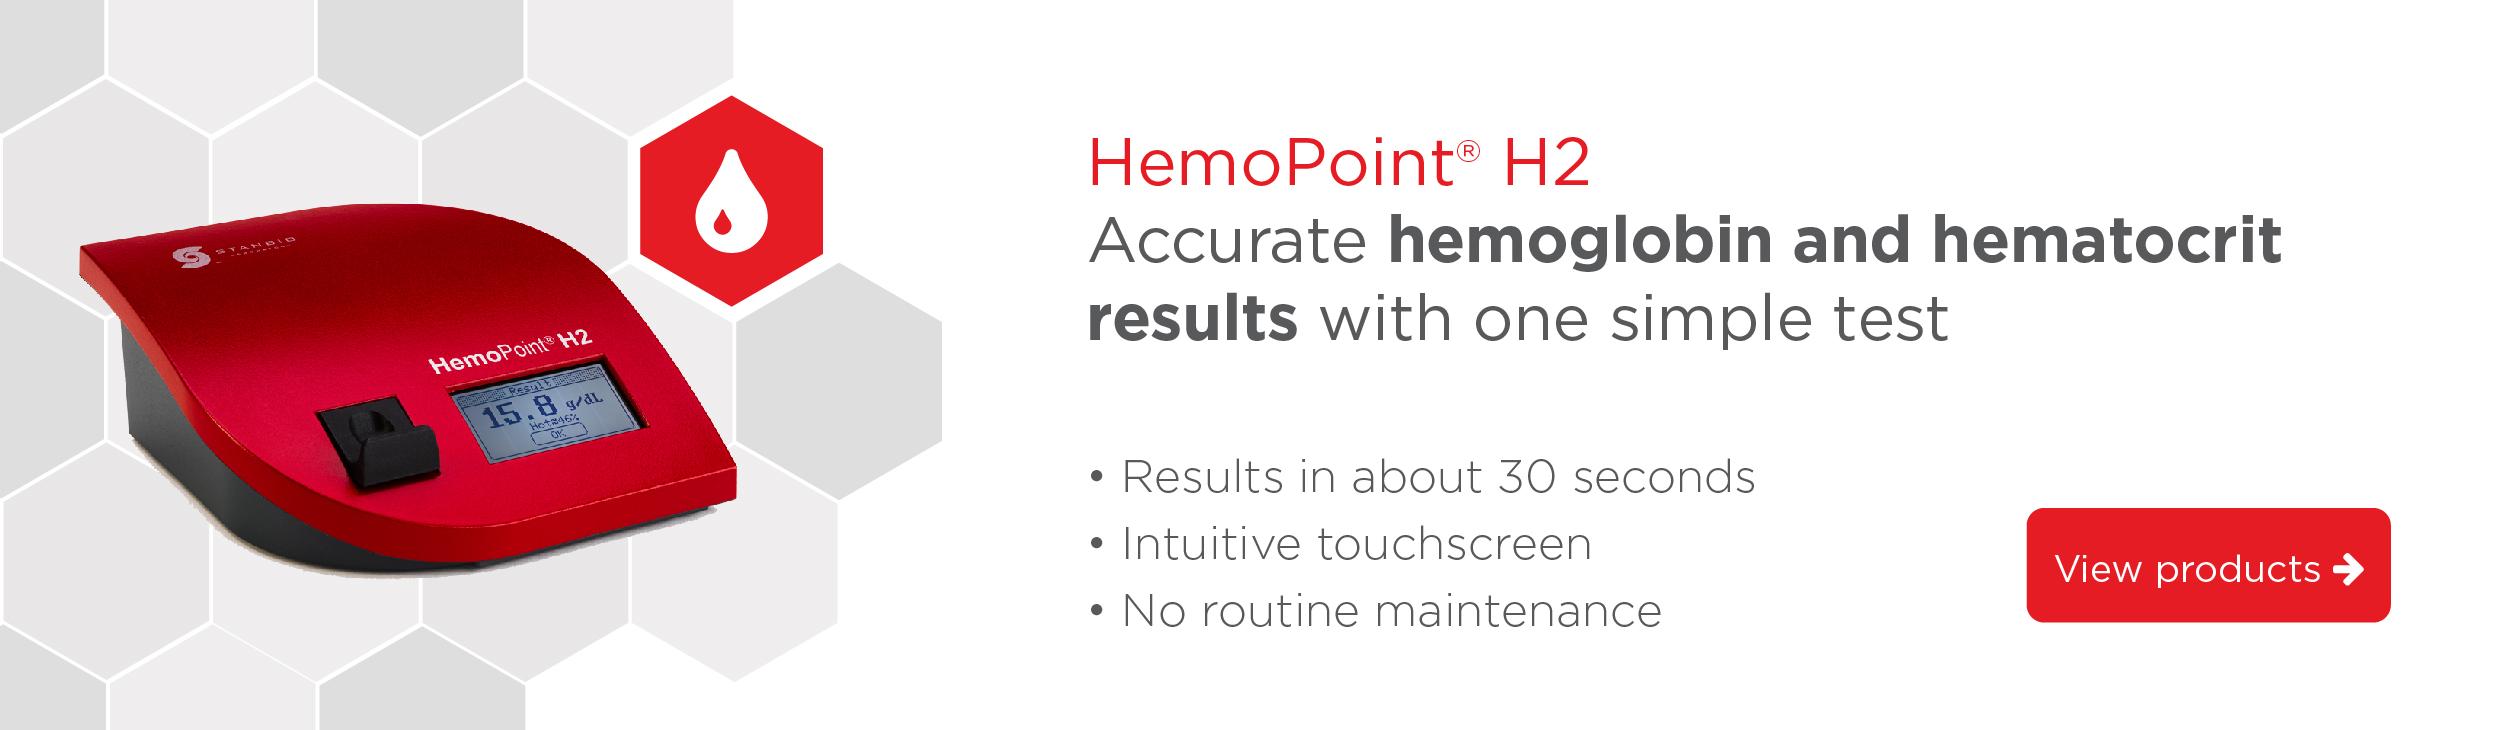 HemoPoint-hemoglobin-analyzer-banner